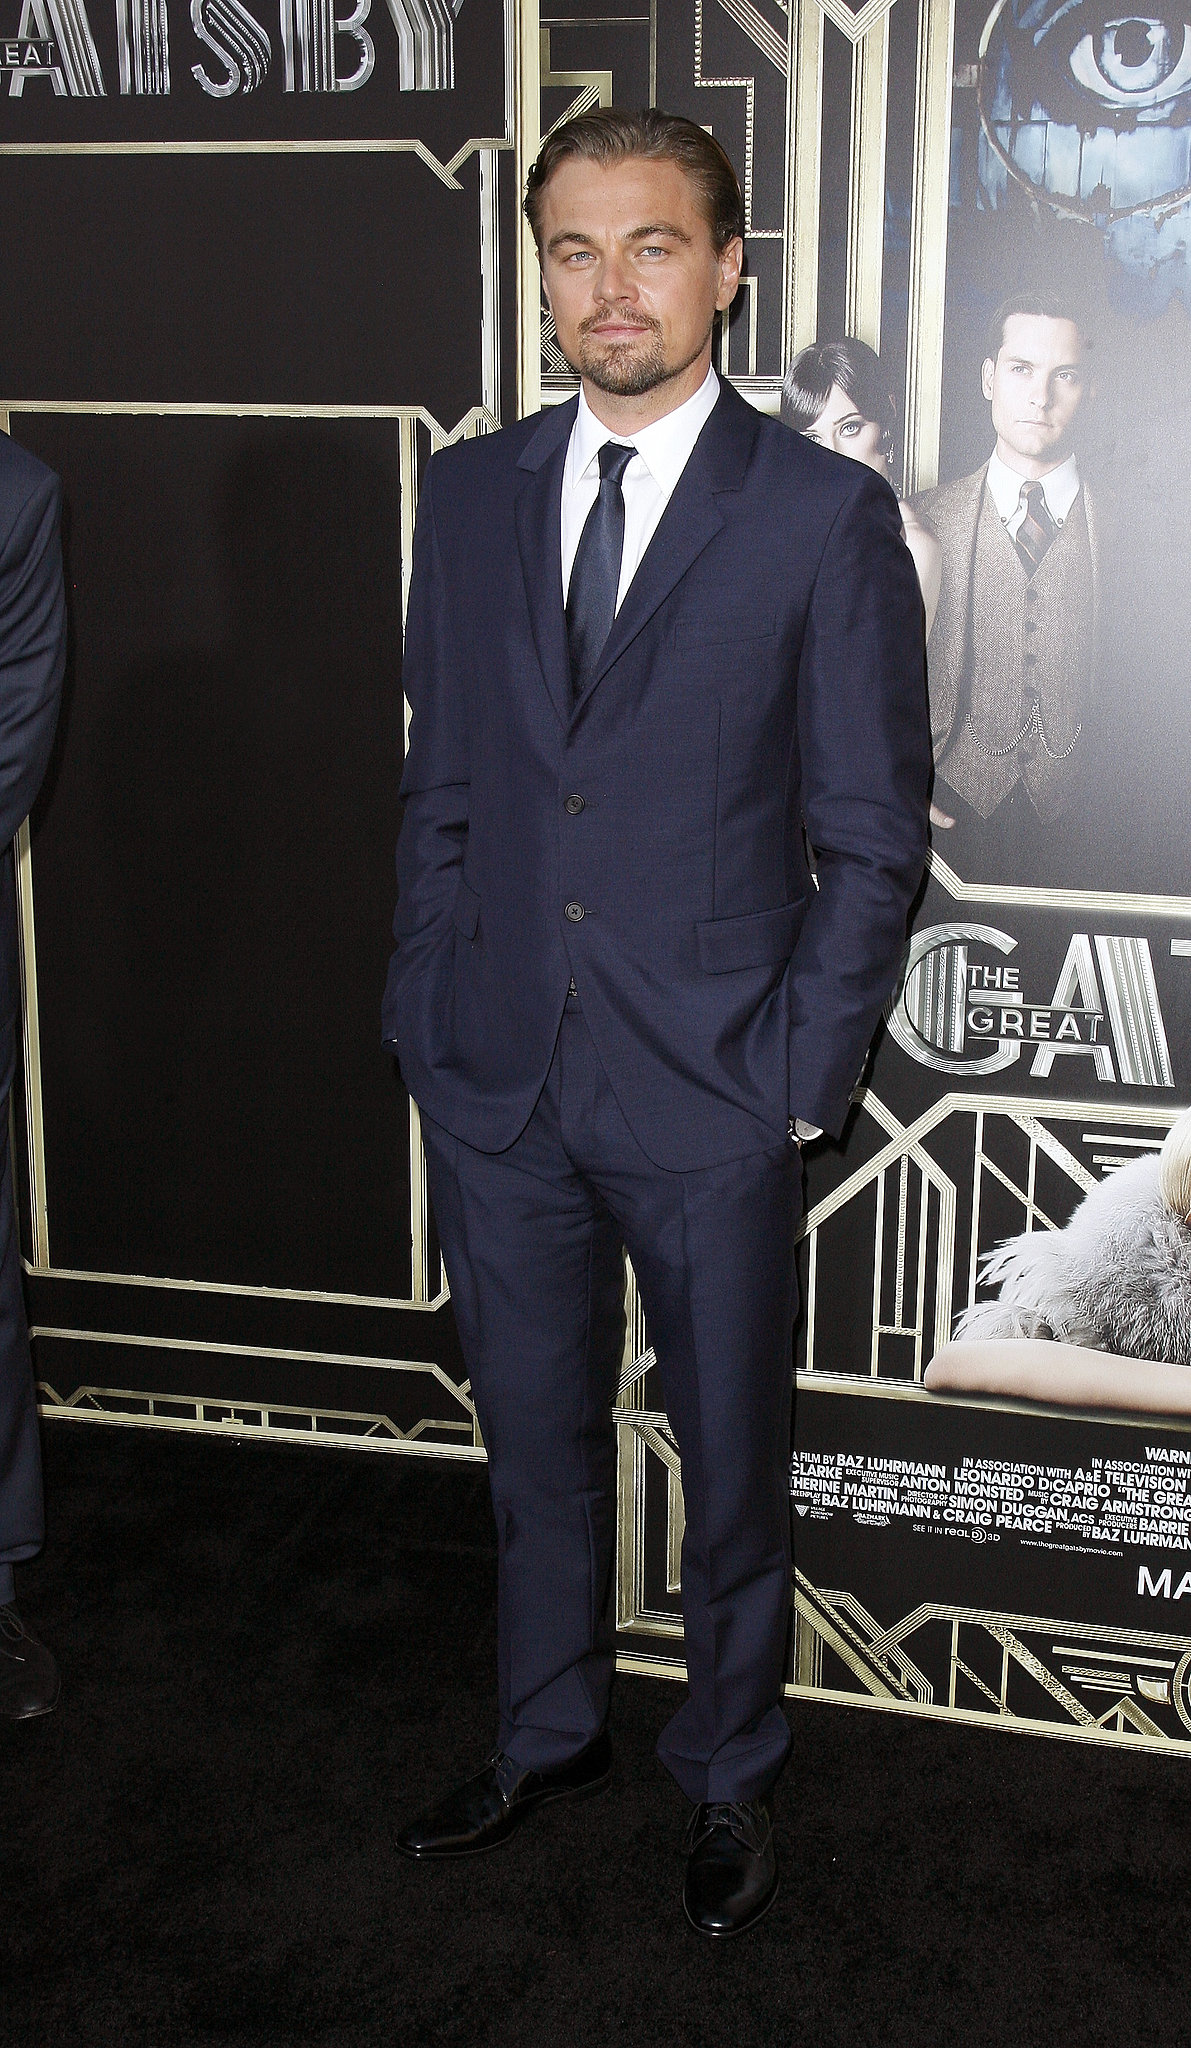 The Great Gatsby star Leonardo DiCaprio looked dapper in a navy blue Prada look.